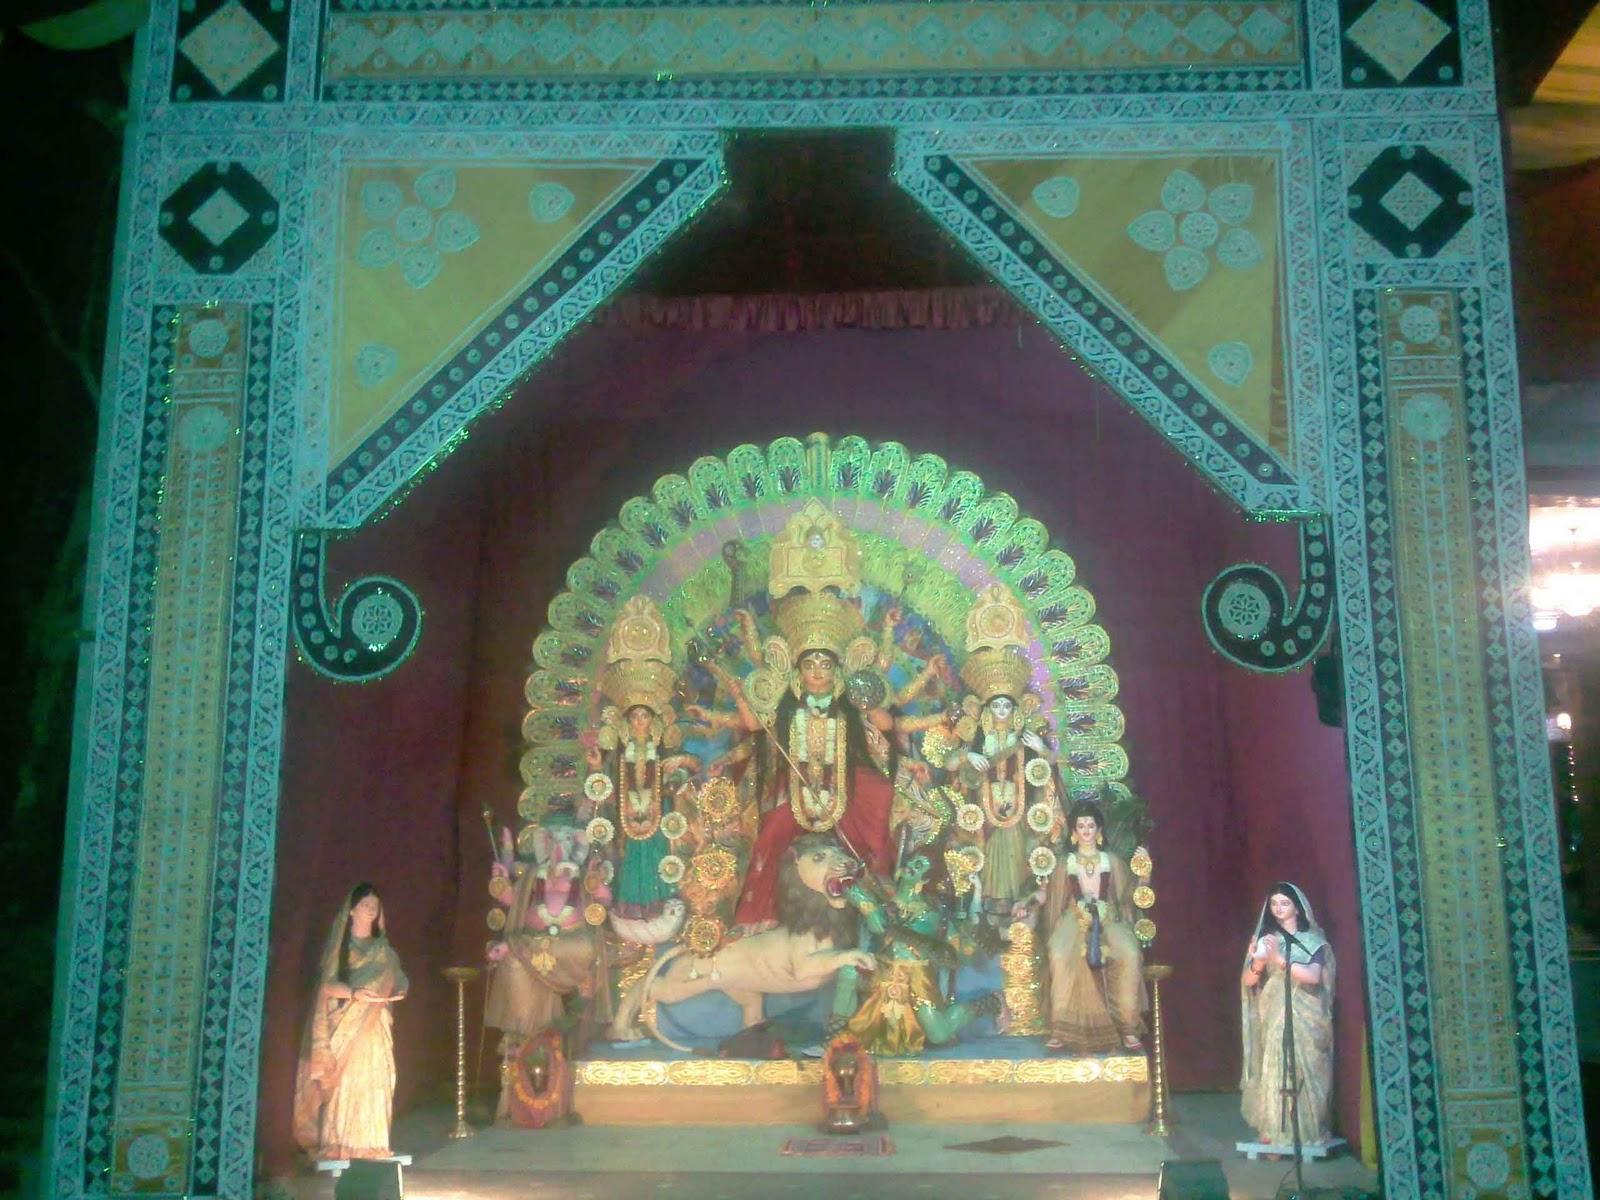 http://2.bp.blogspot.com/_4GsIA8IWB3g/TOVDEbTEU5I/AAAAAAAAA6M/FteBtgXQGDk/s1600/NEW-DELHI-KALI-BARI.jpg